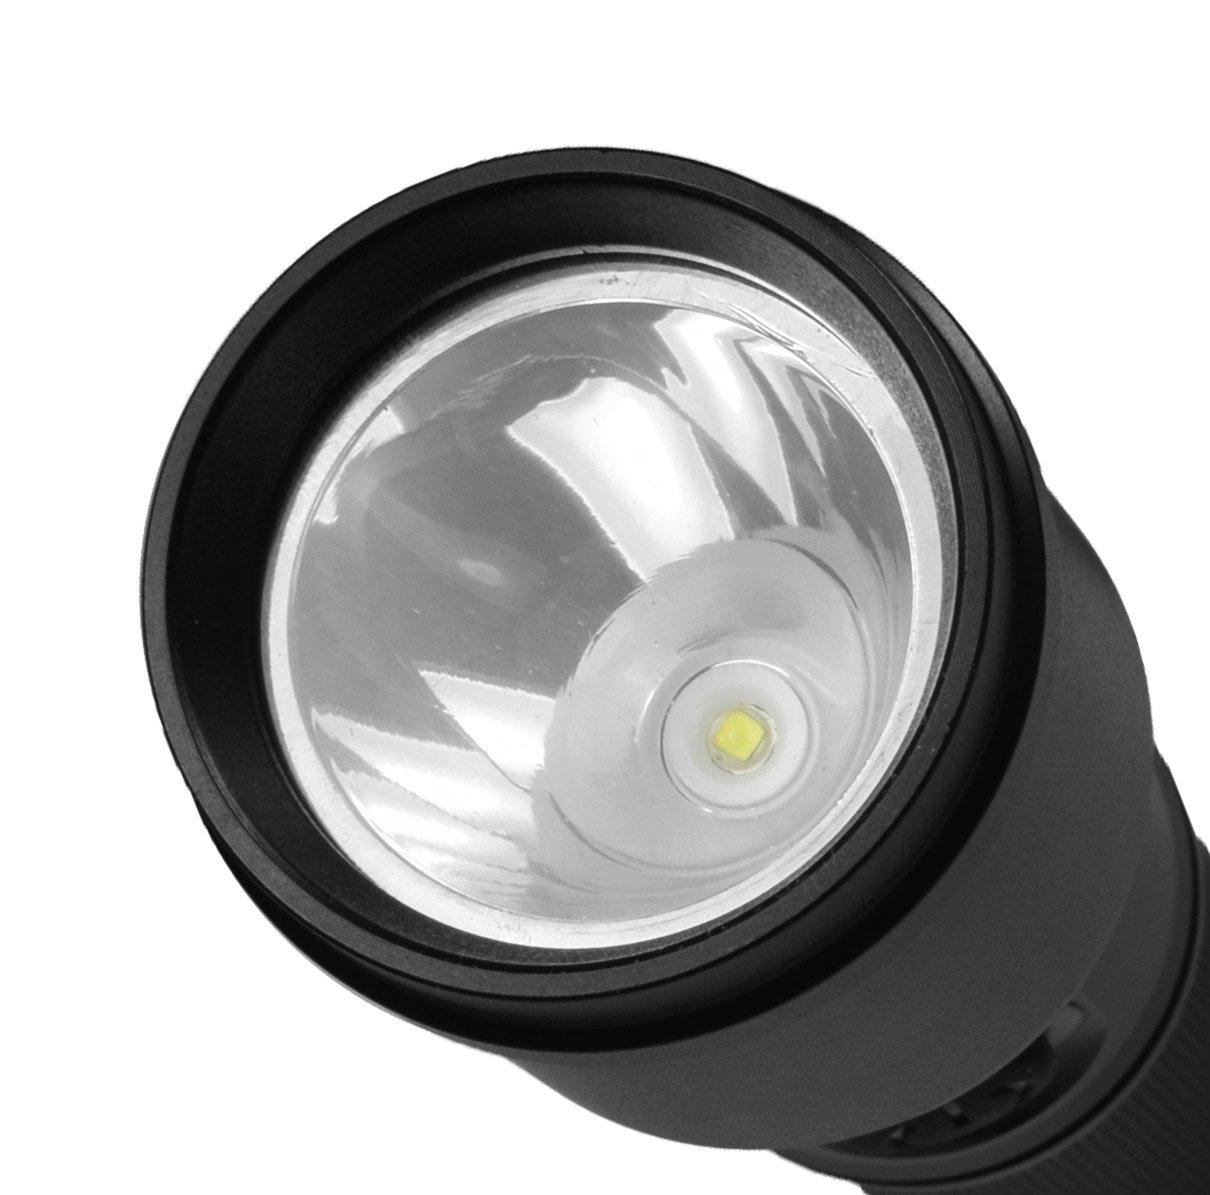 Police Security DuoLite 3AAA - Ultra Bright- Cree LED - Dual Utility Work Flashlight (Spotlight Beam and Area Light) - 300 Lumens - Everyday Use - Dog Walking, Hiking - Lights Your Path by Police Security Flashlights (Image #4)